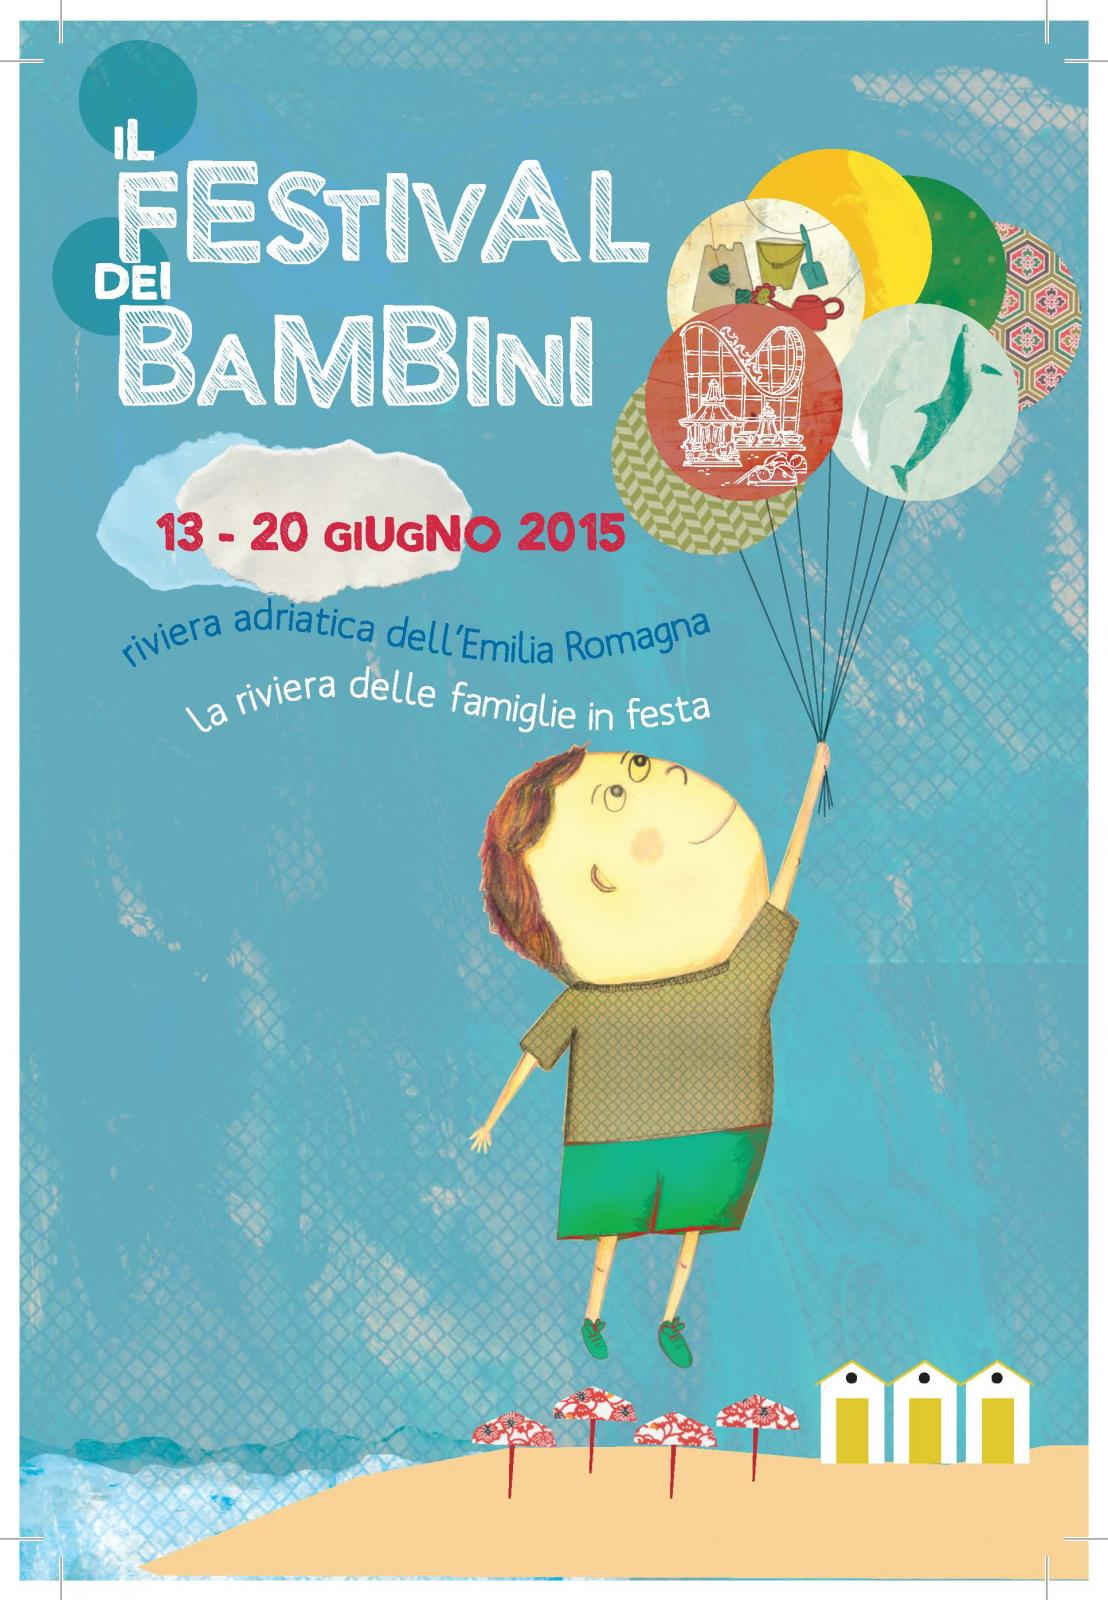 Festival dei Bambini 2015